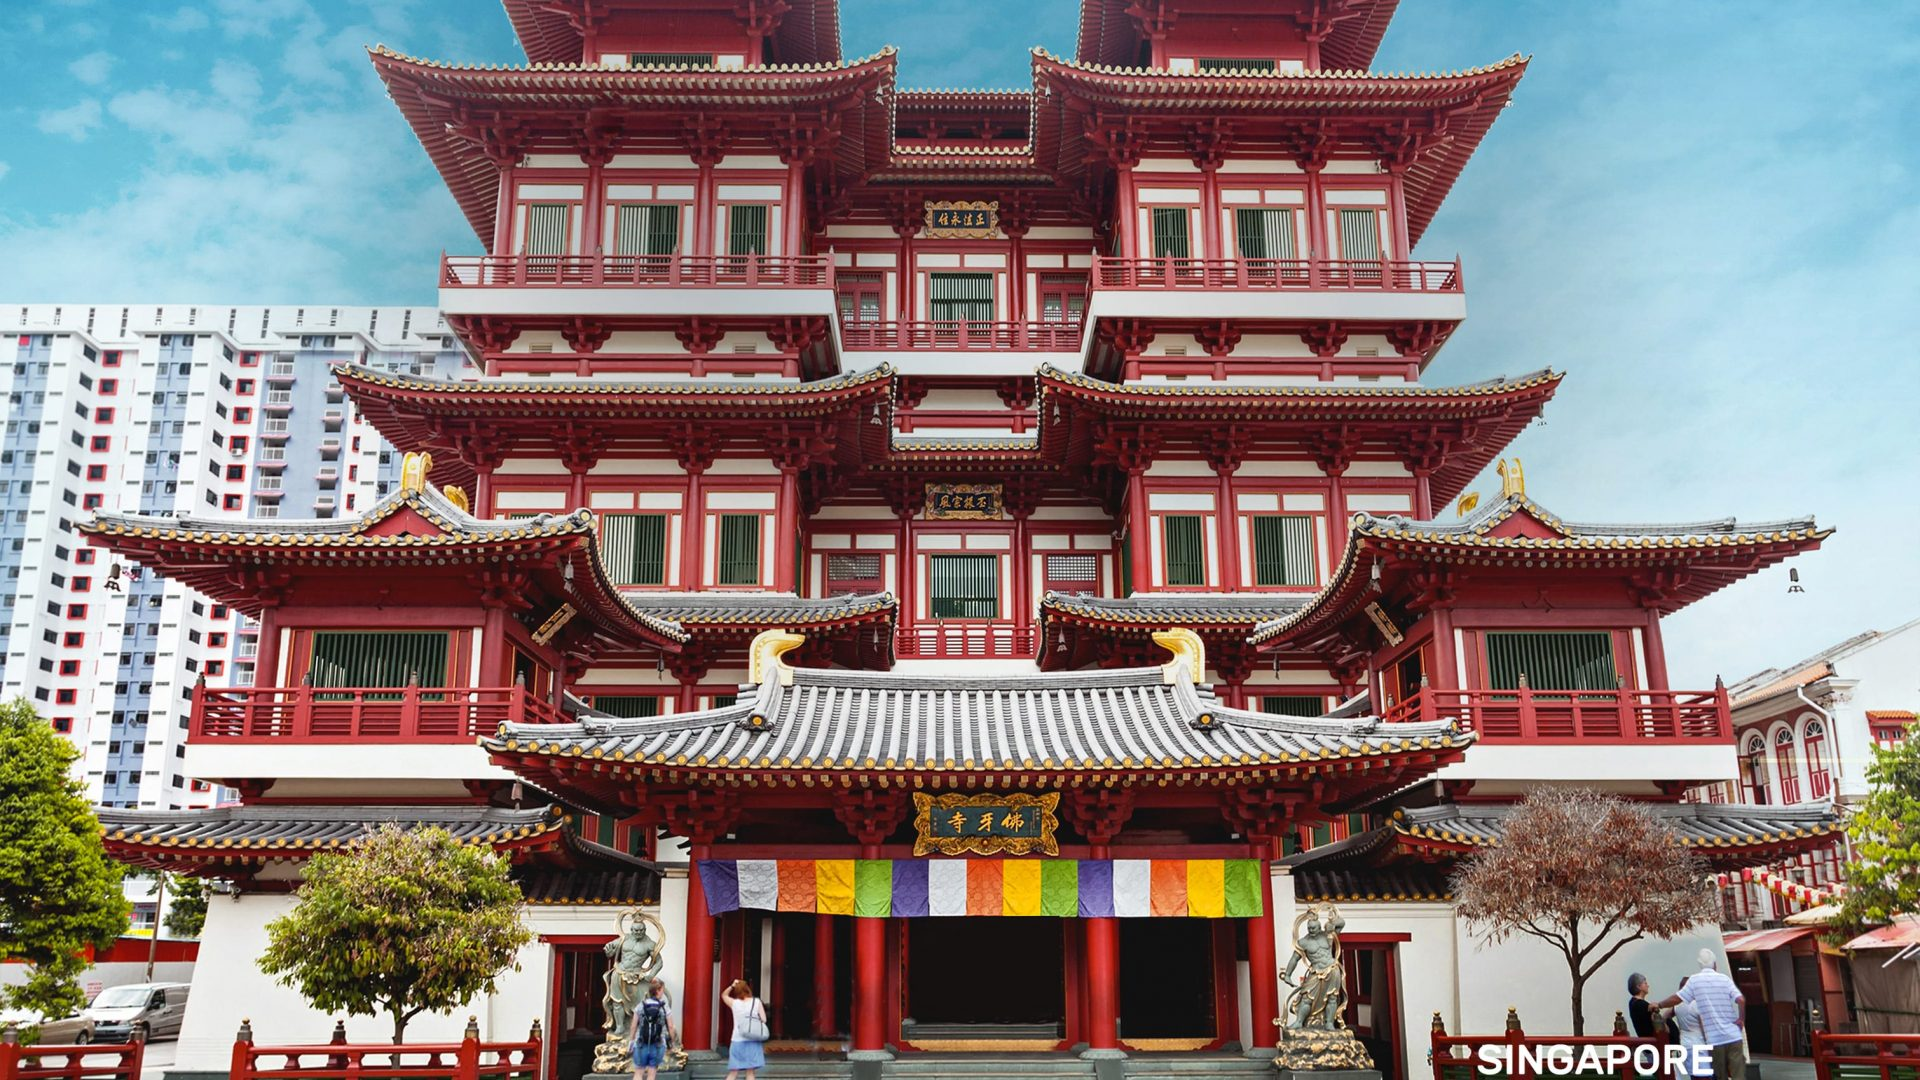 Heritage Buildings in Singapore